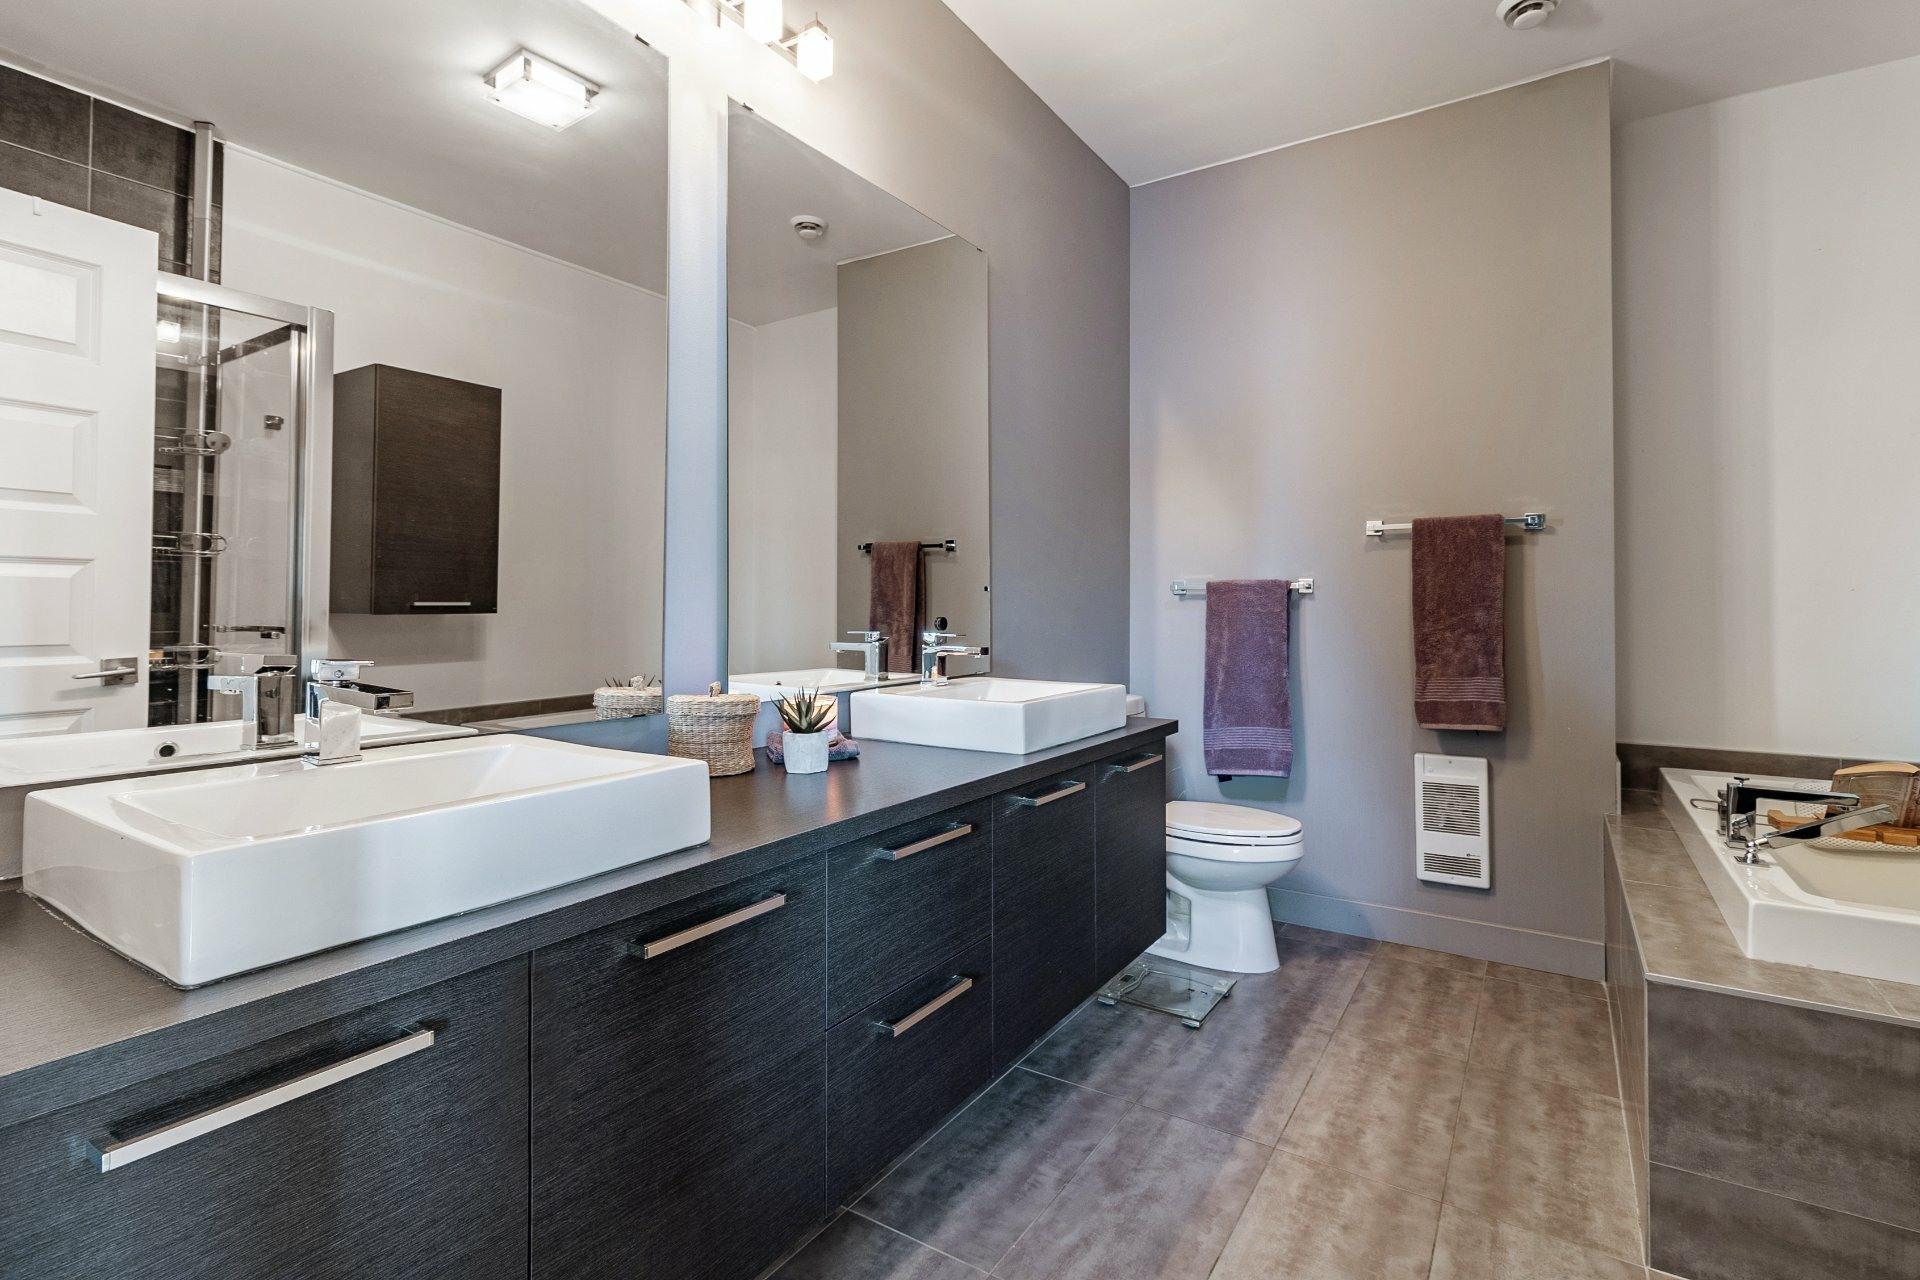 image 17 - Apartment For sale Saint-Hubert Longueuil  - 7 rooms